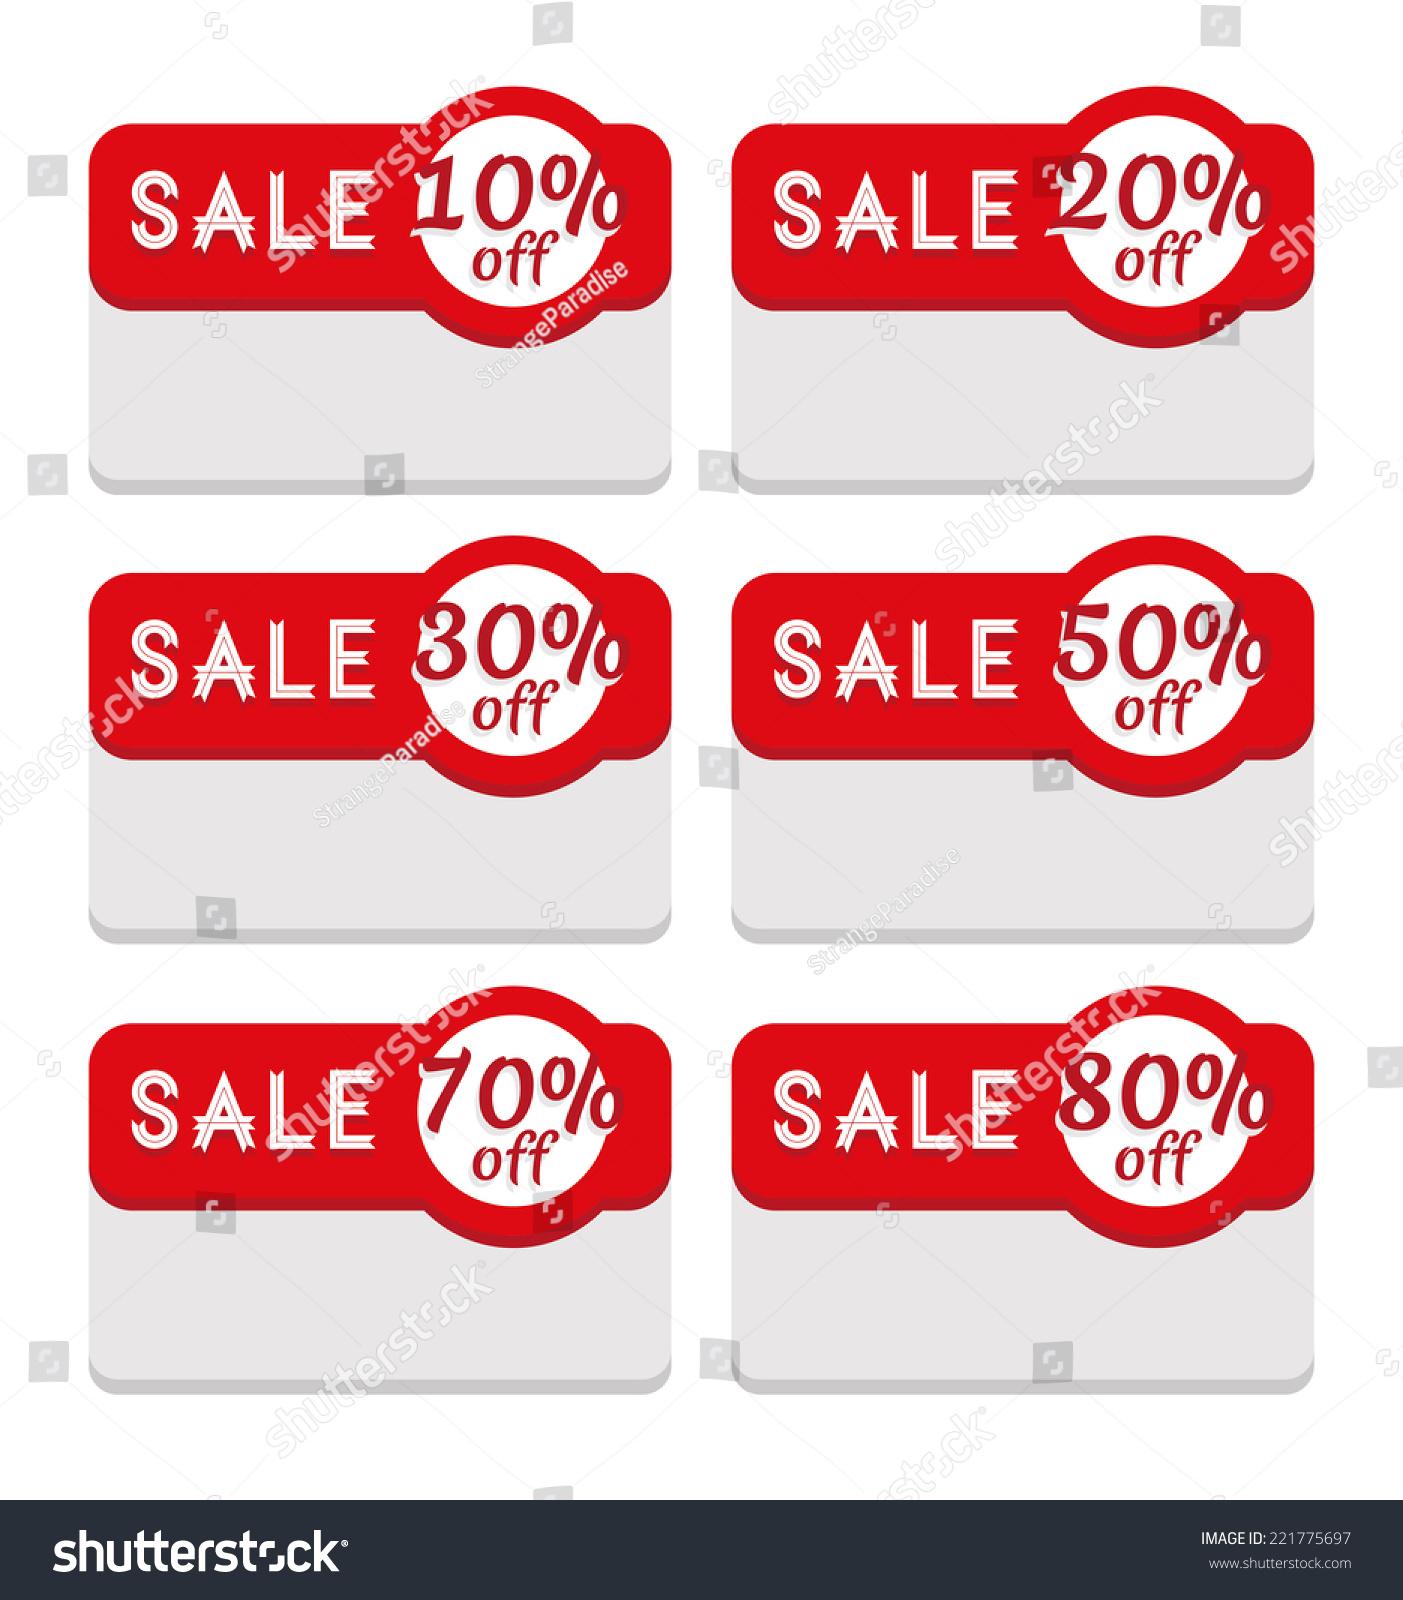 Discount Sale Label Template 10 20 Stock Vector 221775697 ...